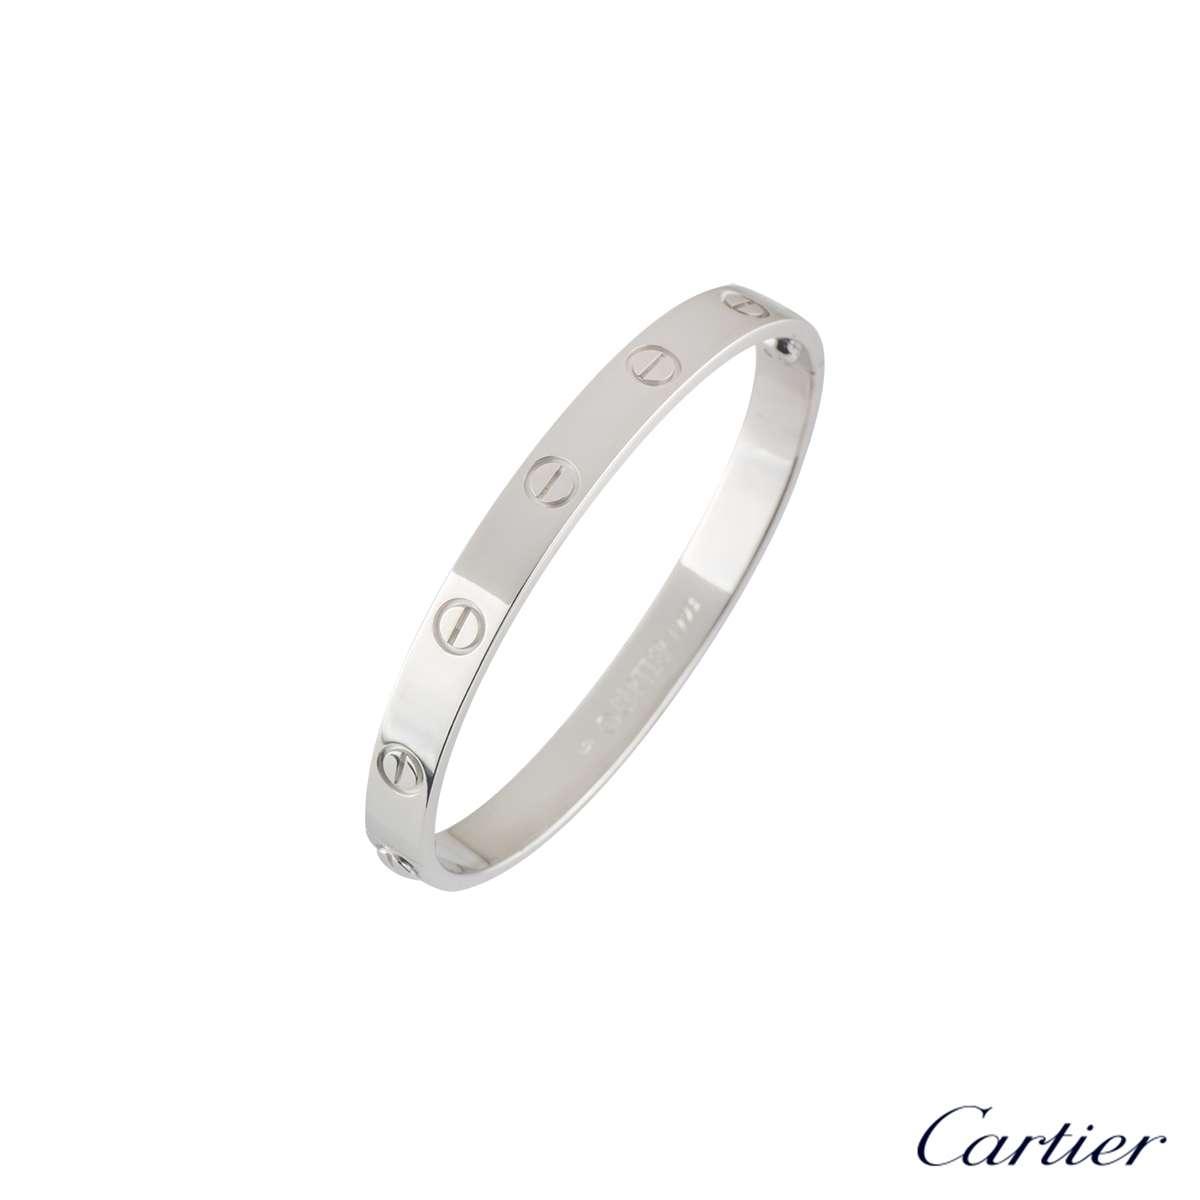 Cartier 18k White Gold Plain Love Bangle Size 16 B6035416